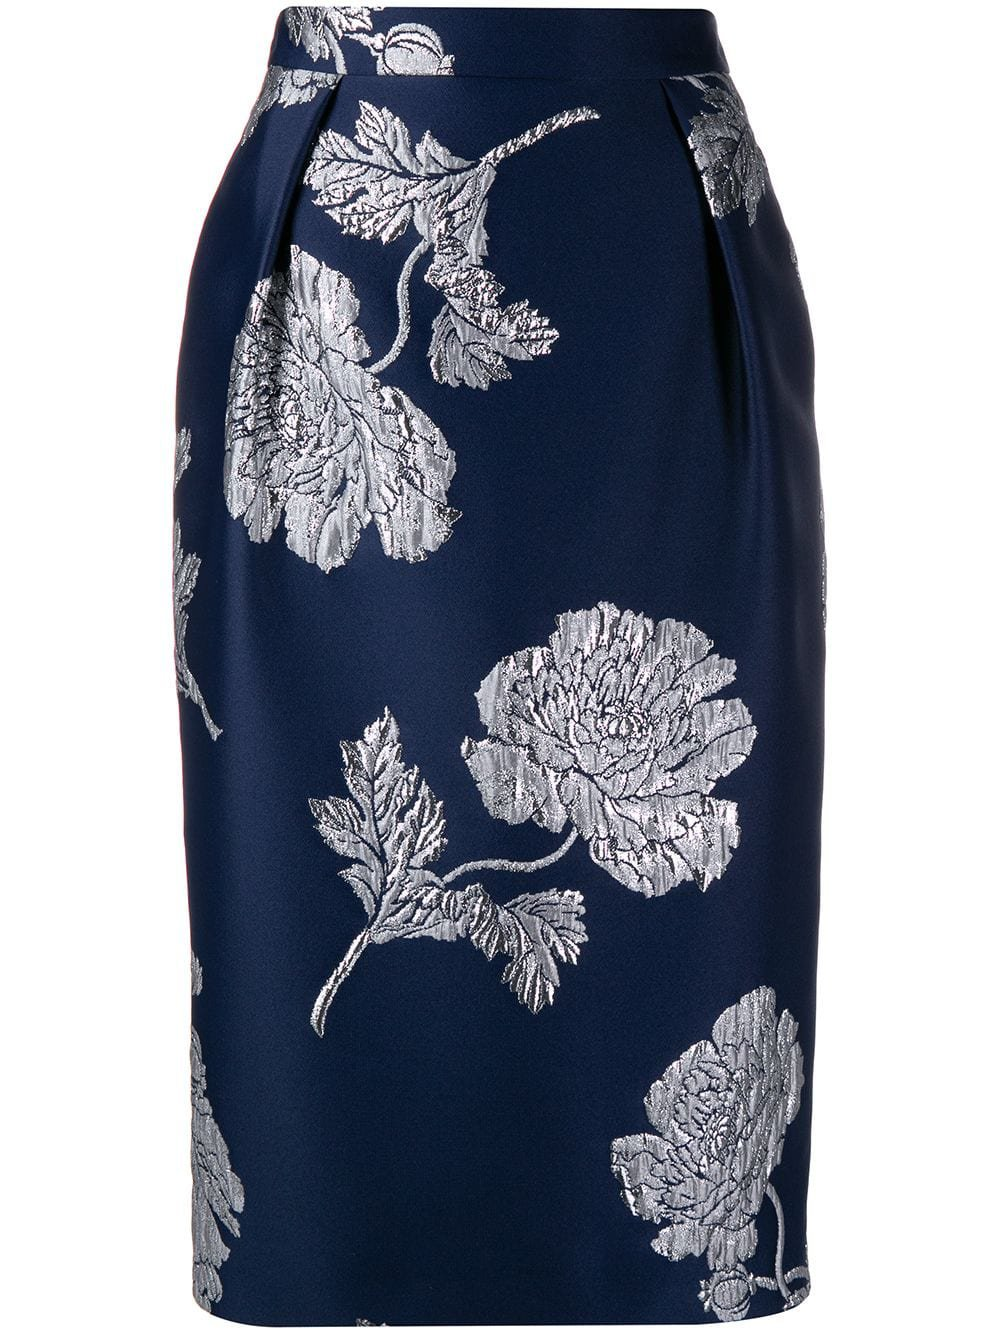 Alexander McQueen Floral Jacquard Pencil Skirt - Farfetch